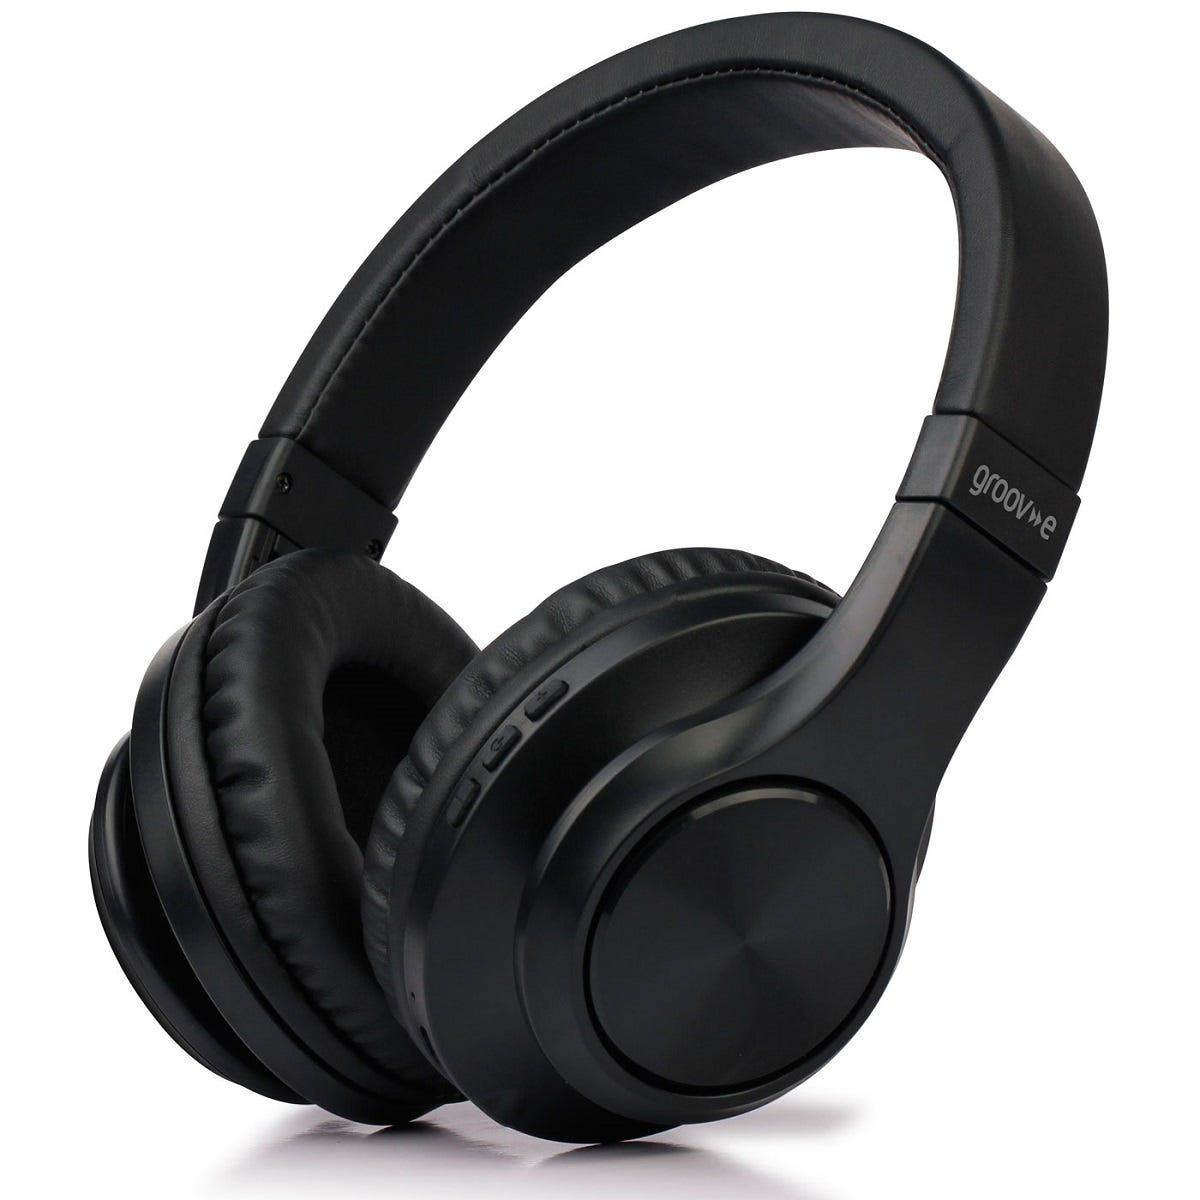 Groov-e Rhythm Wireless Bluetooth Headphones - Black